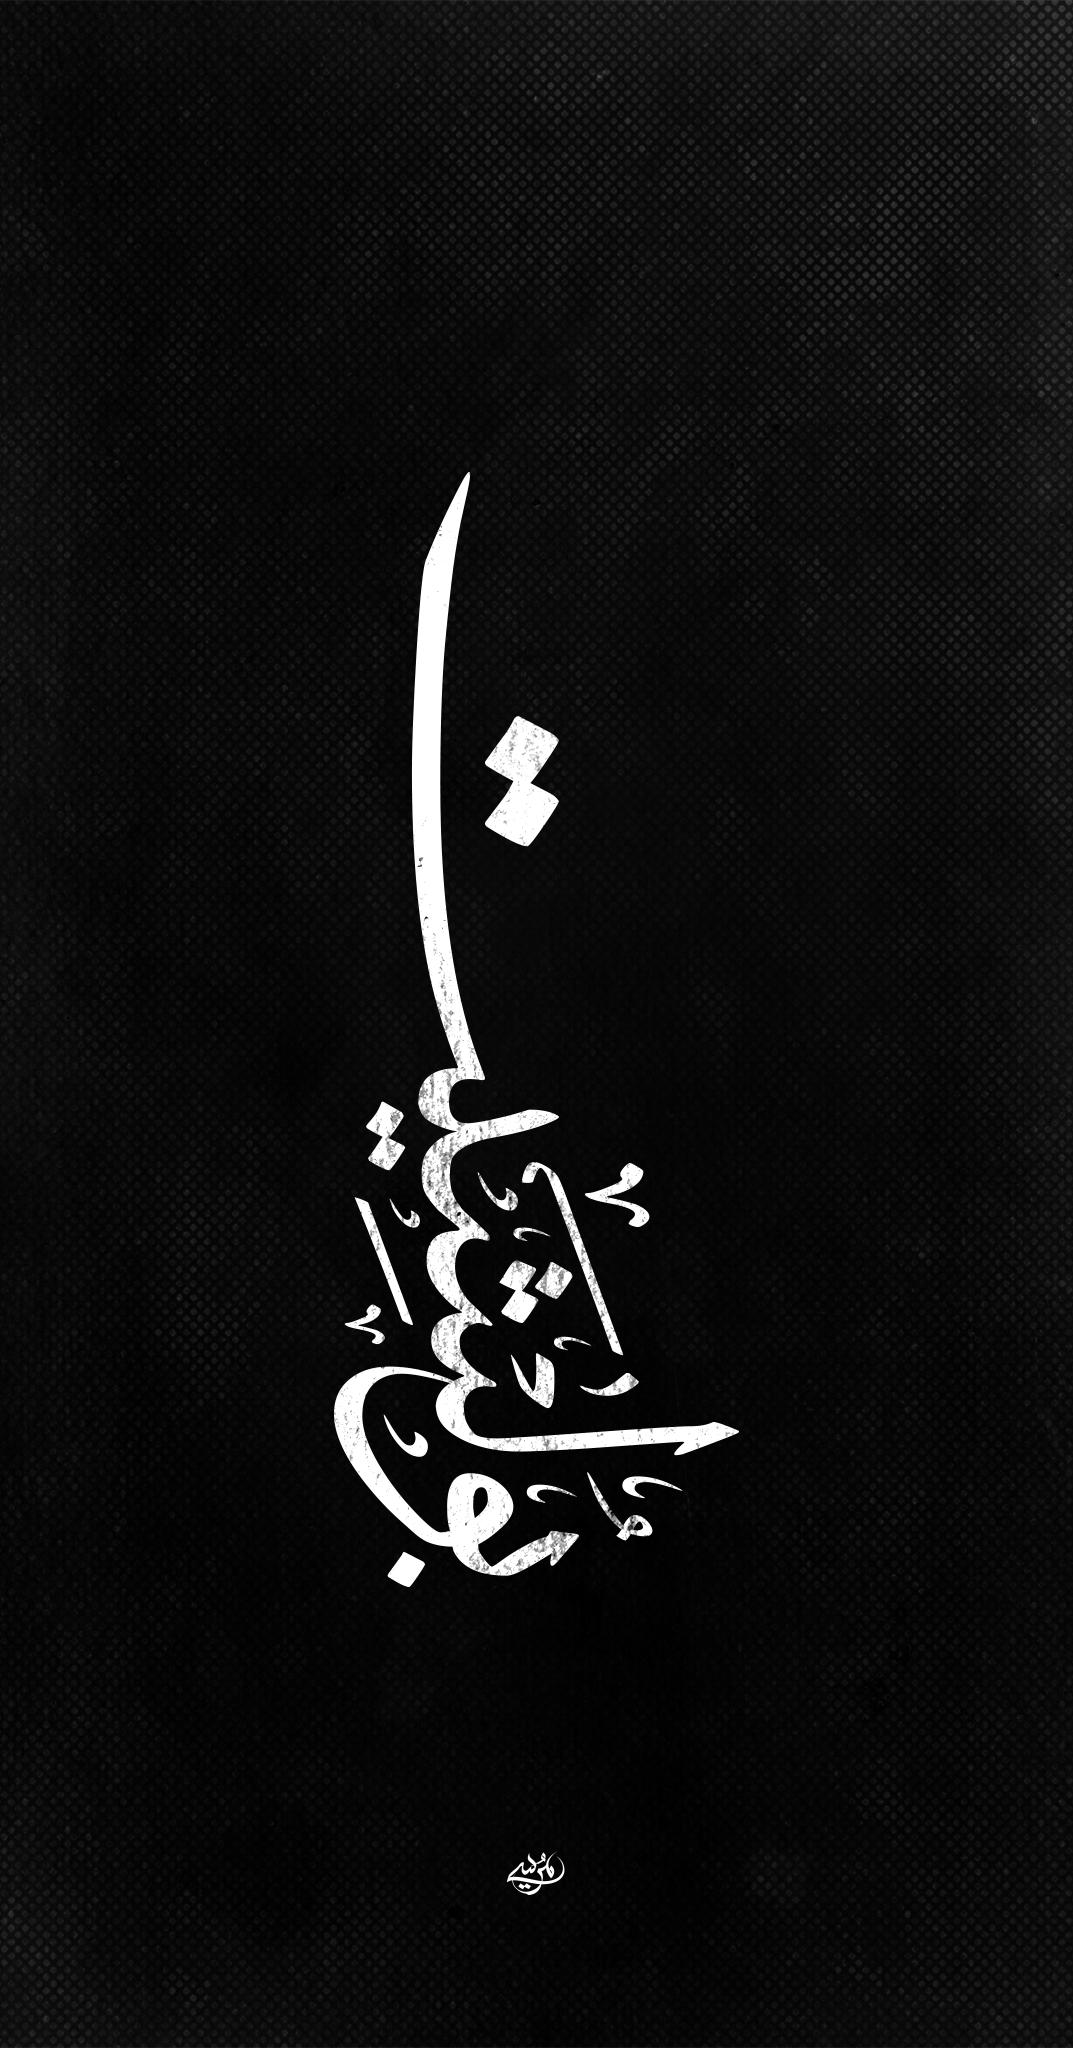 Arabic Typography Typo Calligraphy Art Lettering Typeface تايبوجرافي تايبوغرافي خط تايبو كاليجرافي خط Art Wallpaper Mobile Wallpaper Arabic Words